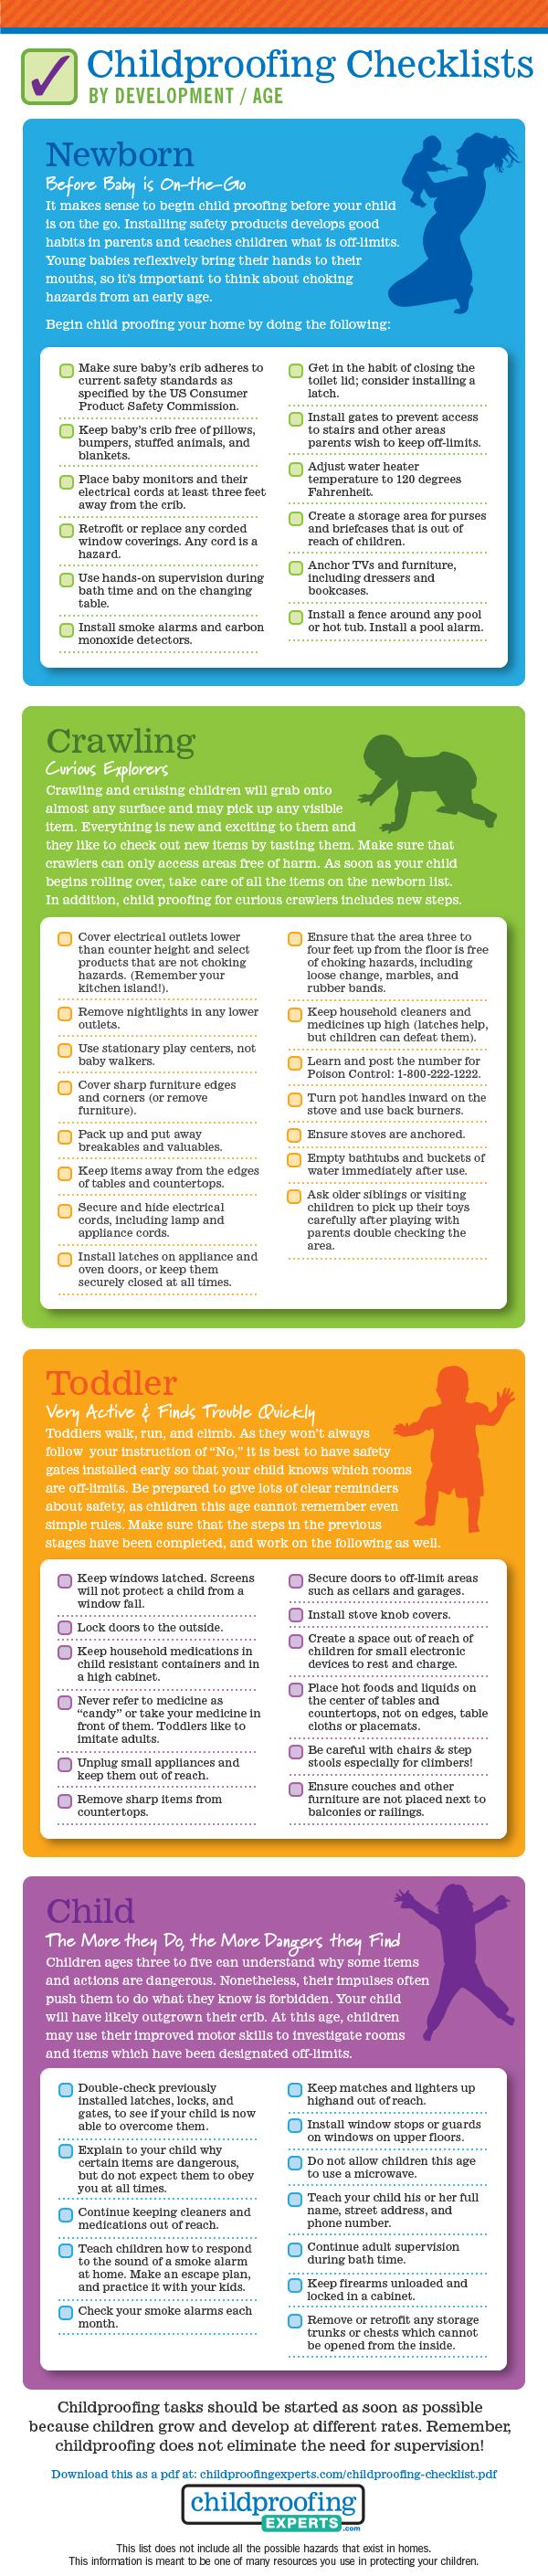 childproofing-checklist